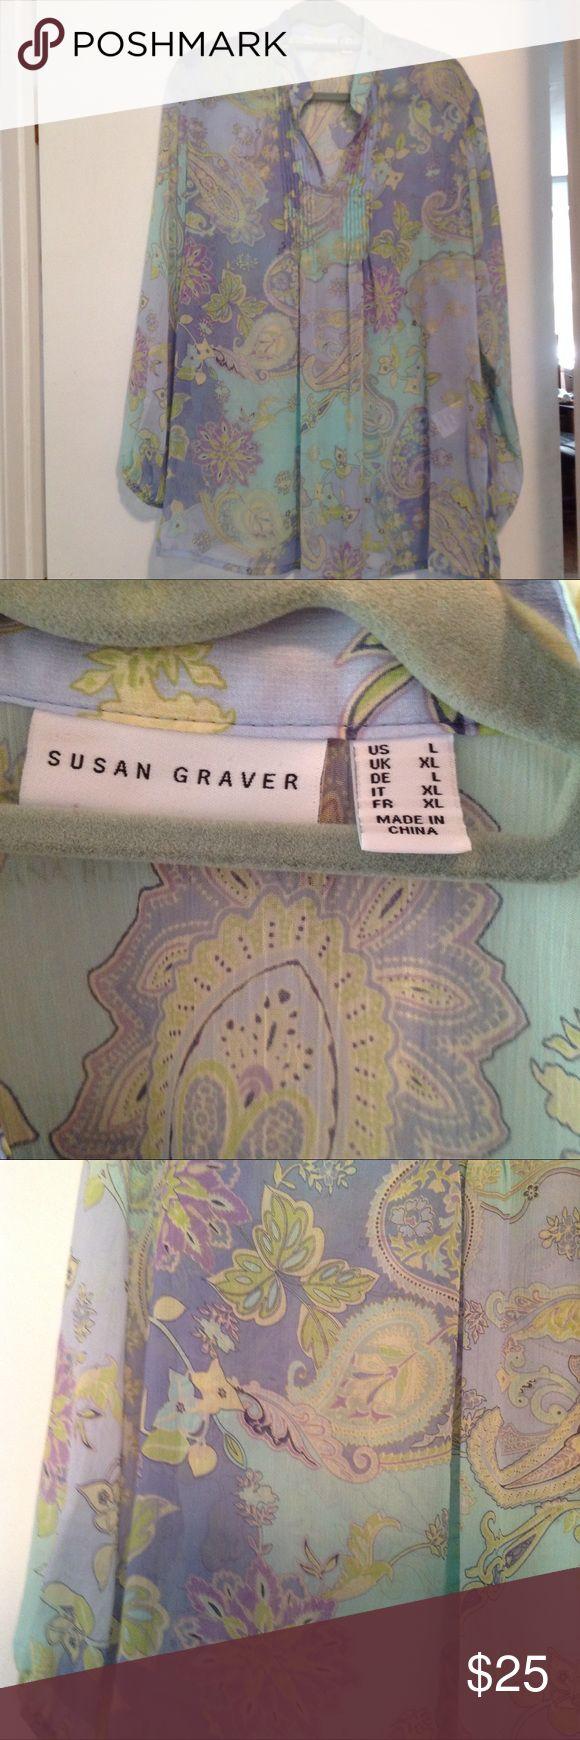 Susan Graver Sheer Tunic New size Large Blue\Green Susan Graver NEW blue\green Sheer tunic size large, no defects Susan Graver Tops Tunics